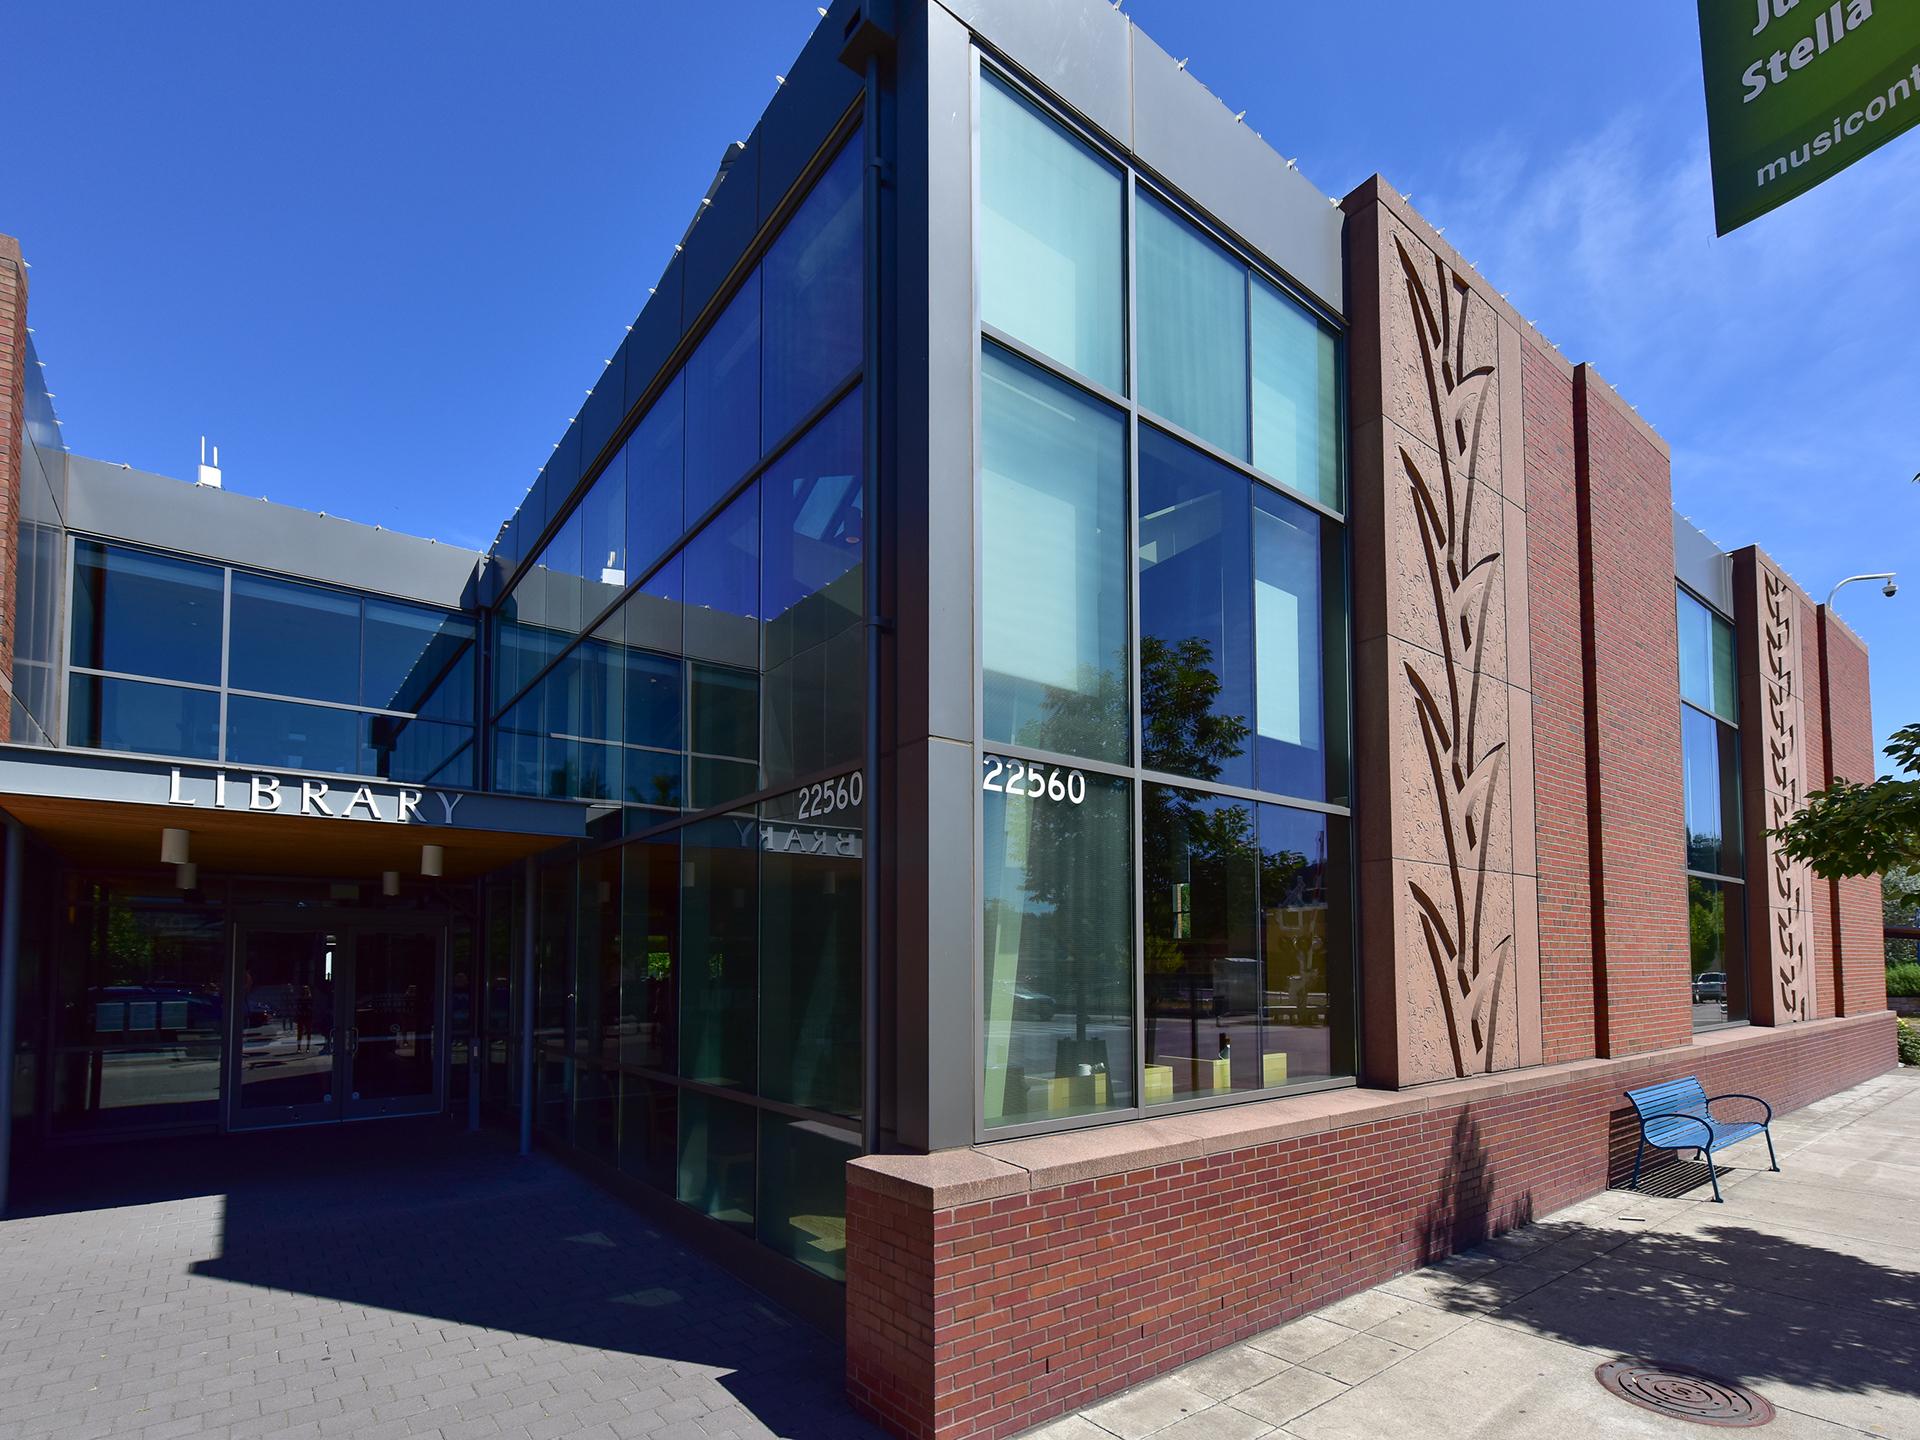 Sherwood Library